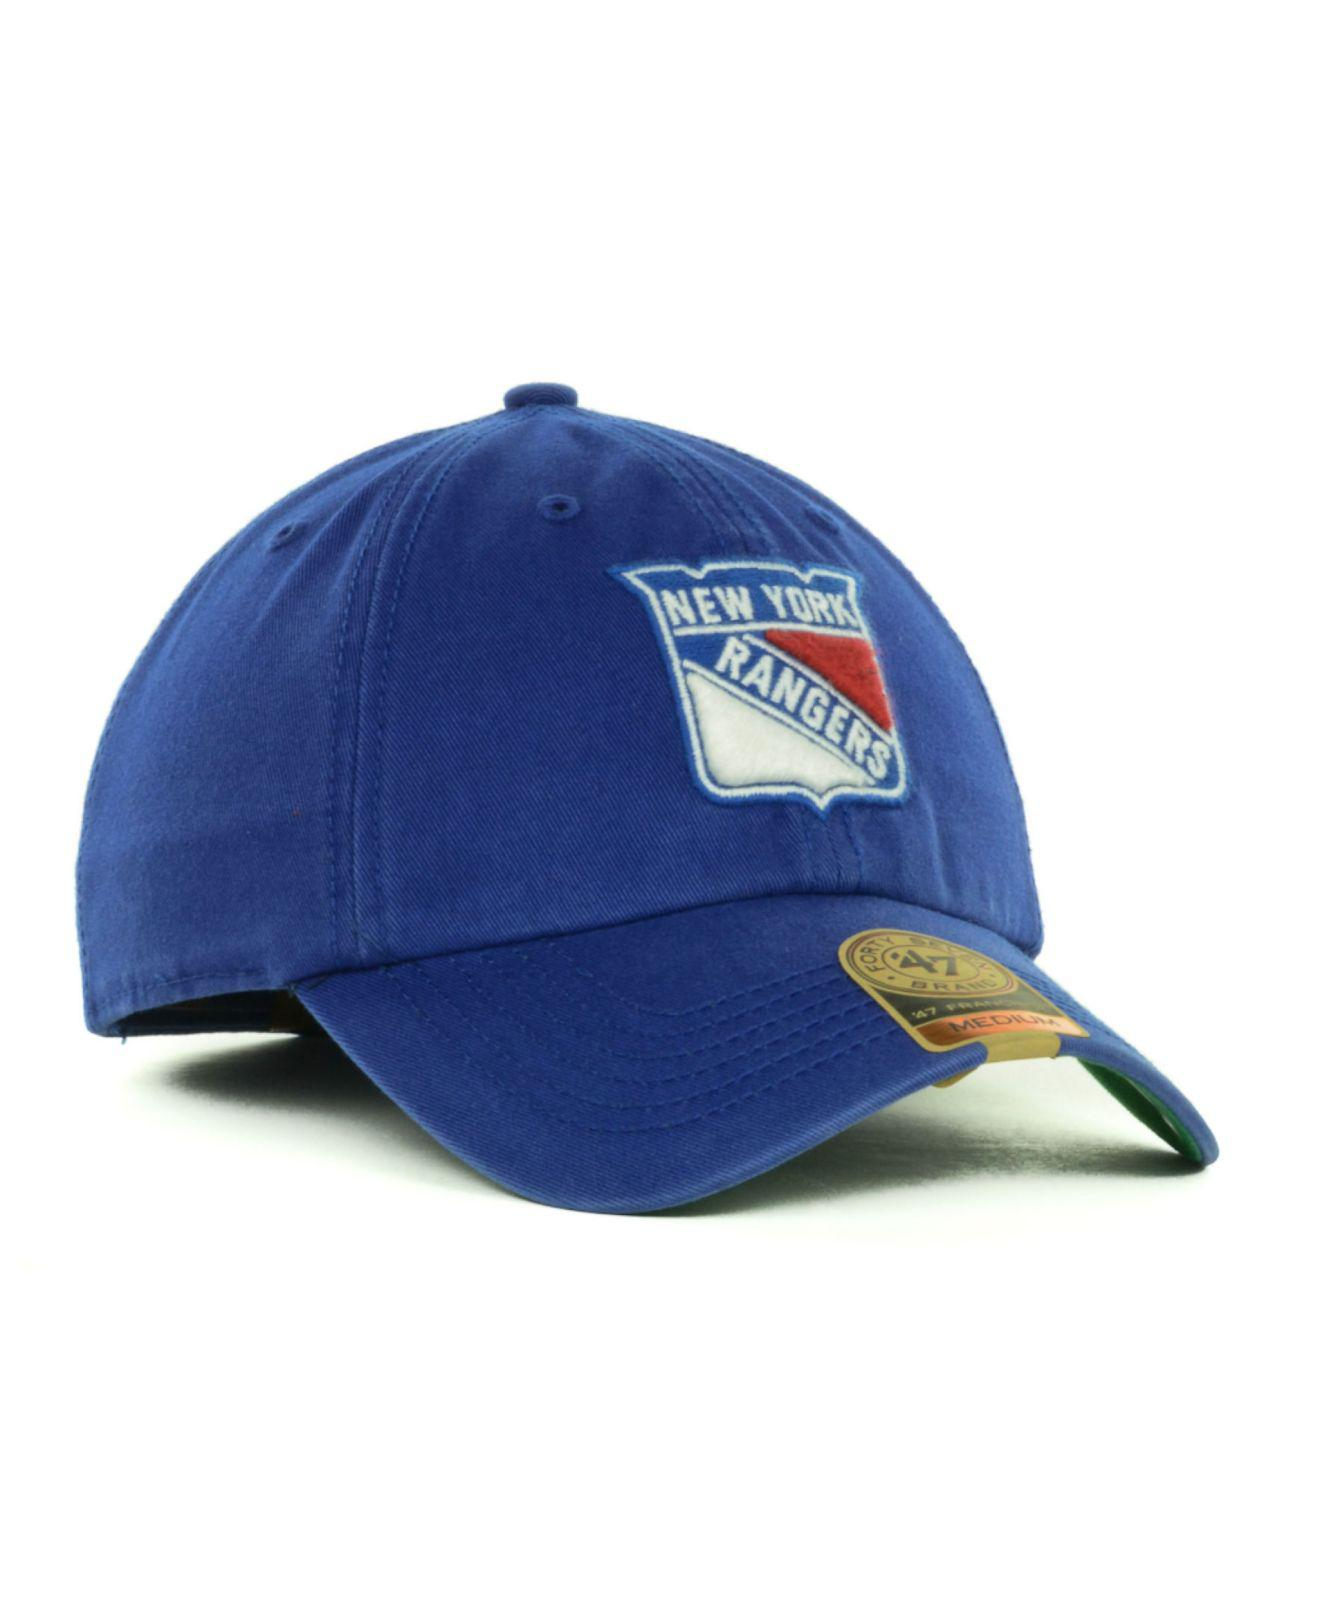 cd1b20eb5d209a 47 Brand New York Rangers Nhl 47 Franchise Cap in Blue for Men - Lyst